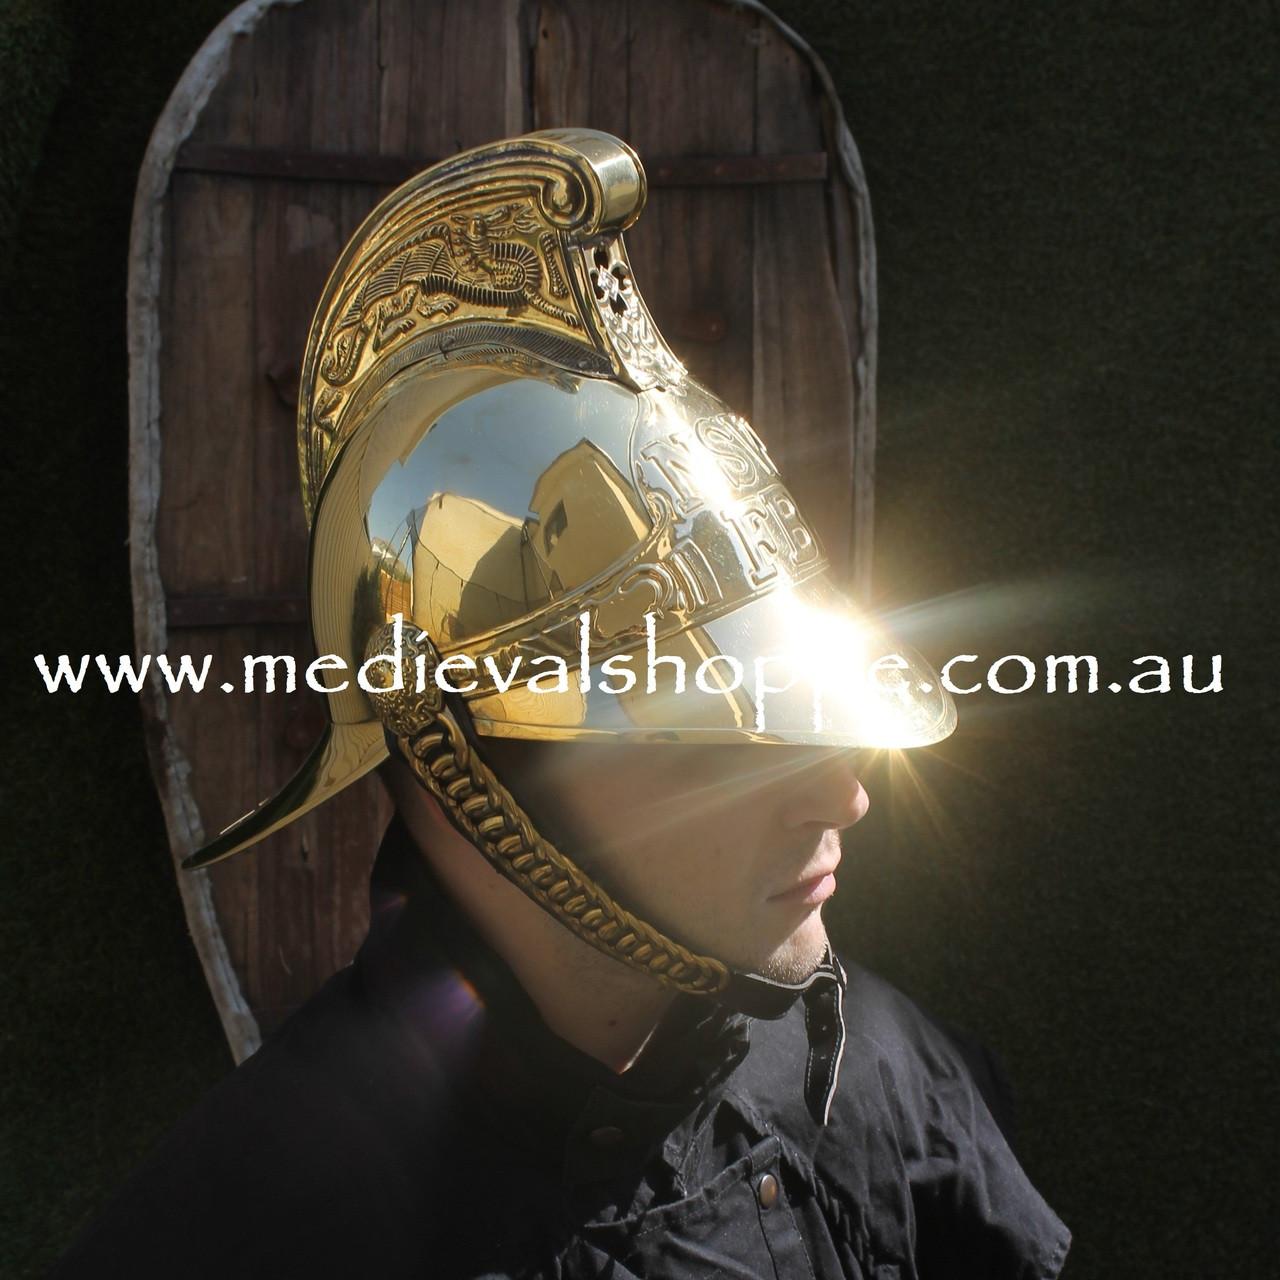 New South Wales 19th Century Fireman's Helmet (Replica)